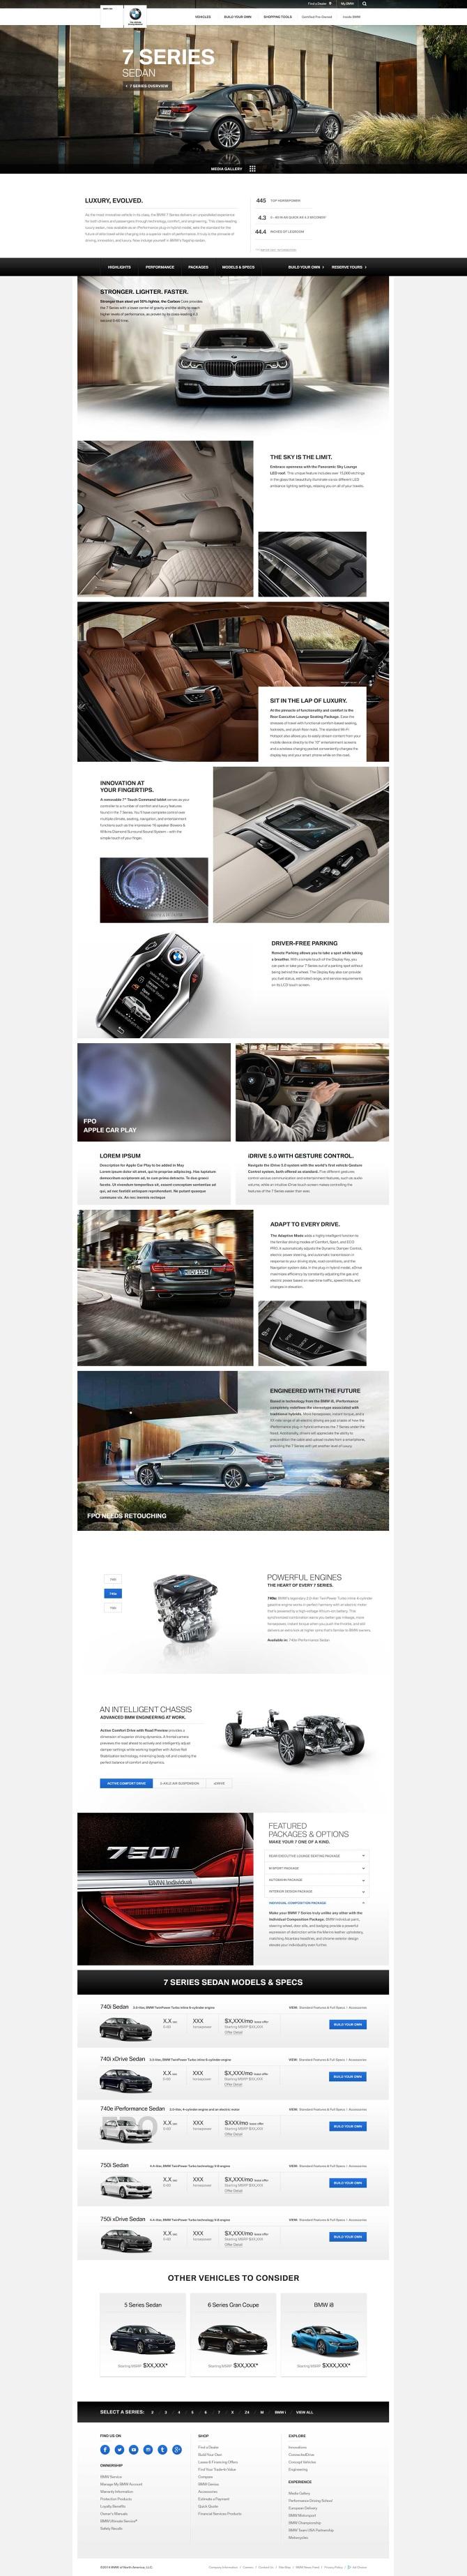 BMW_MY17_7Series_Sedan_2016_0415_670.jpg